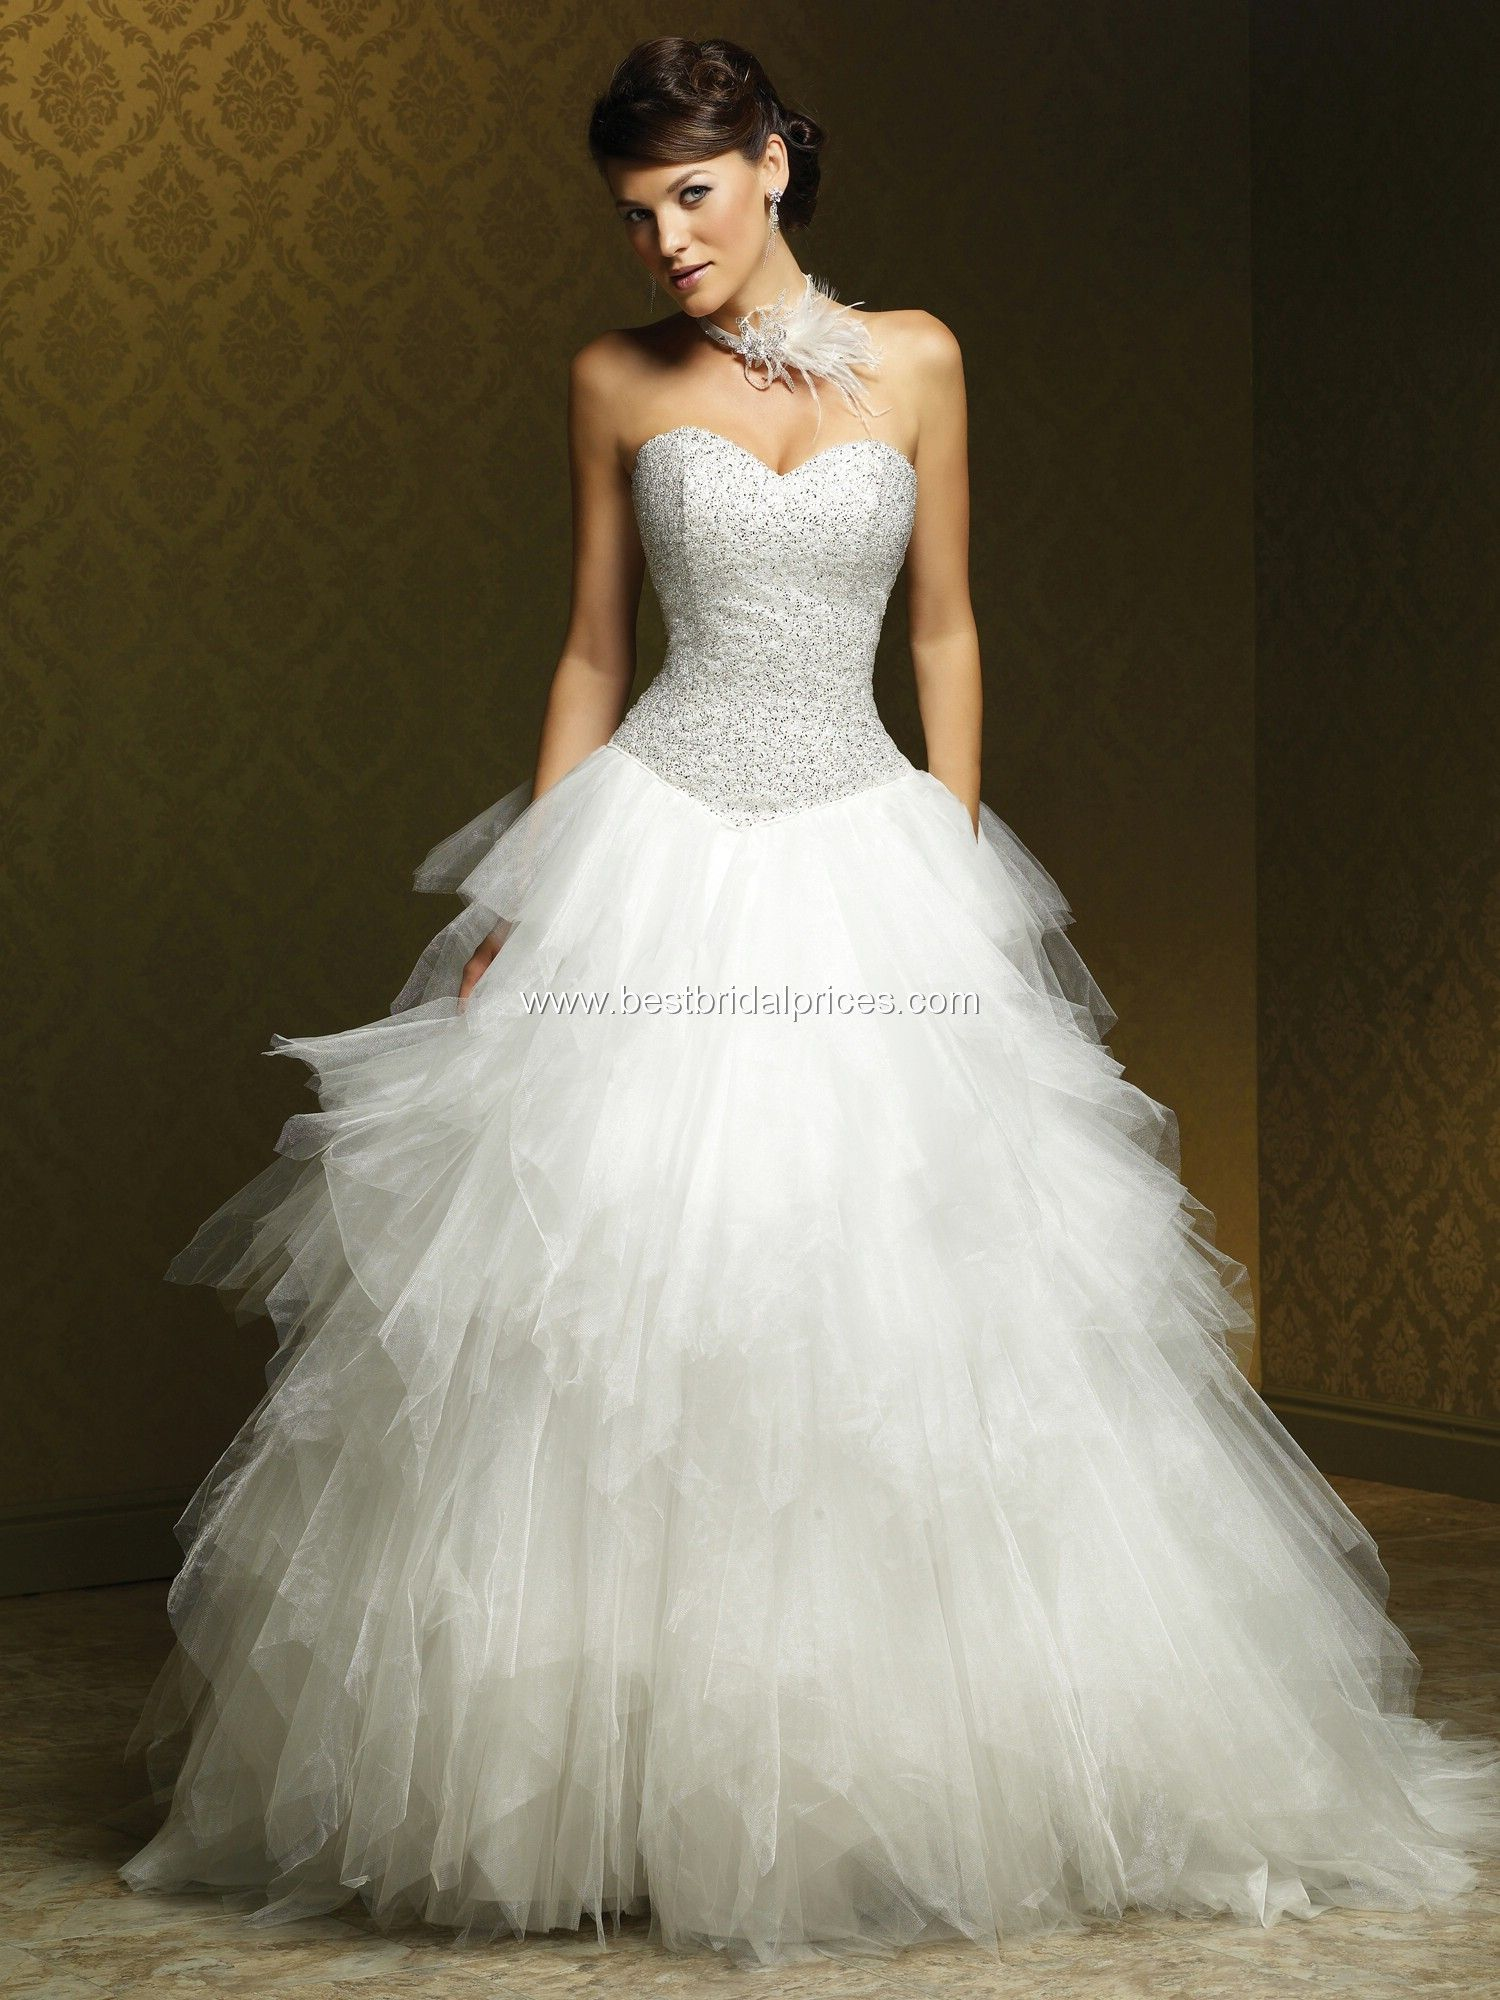 White and silver wedding dresses  Vestido de Novia VN frente  Talle  en color blanco